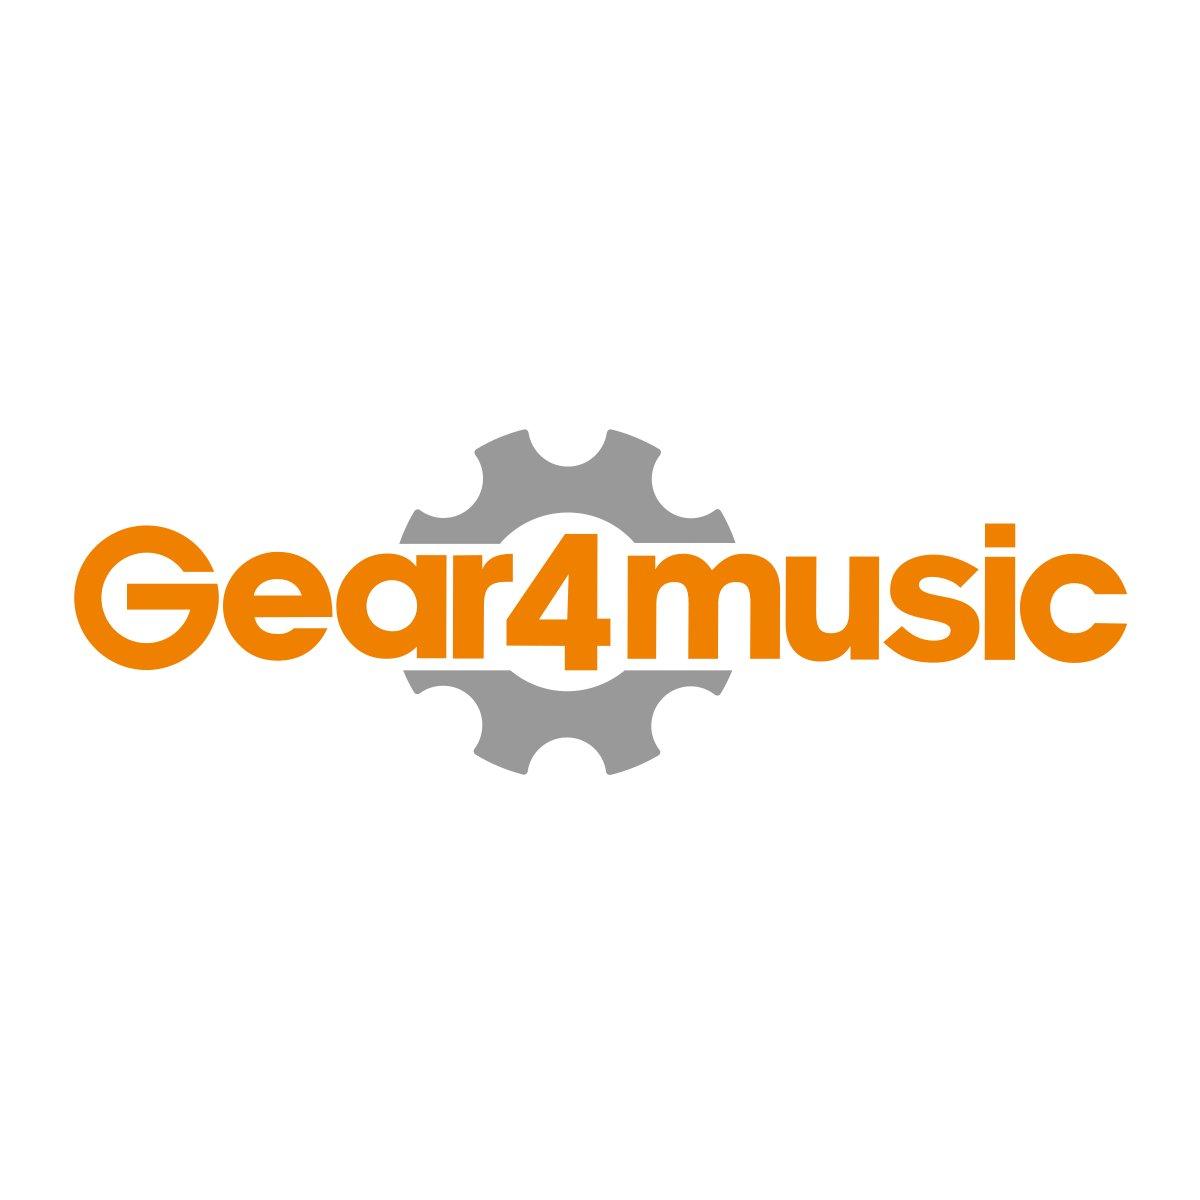 Klassisk Electro Akustisk Gitar, Svart, Gear4music + Amp Pakke